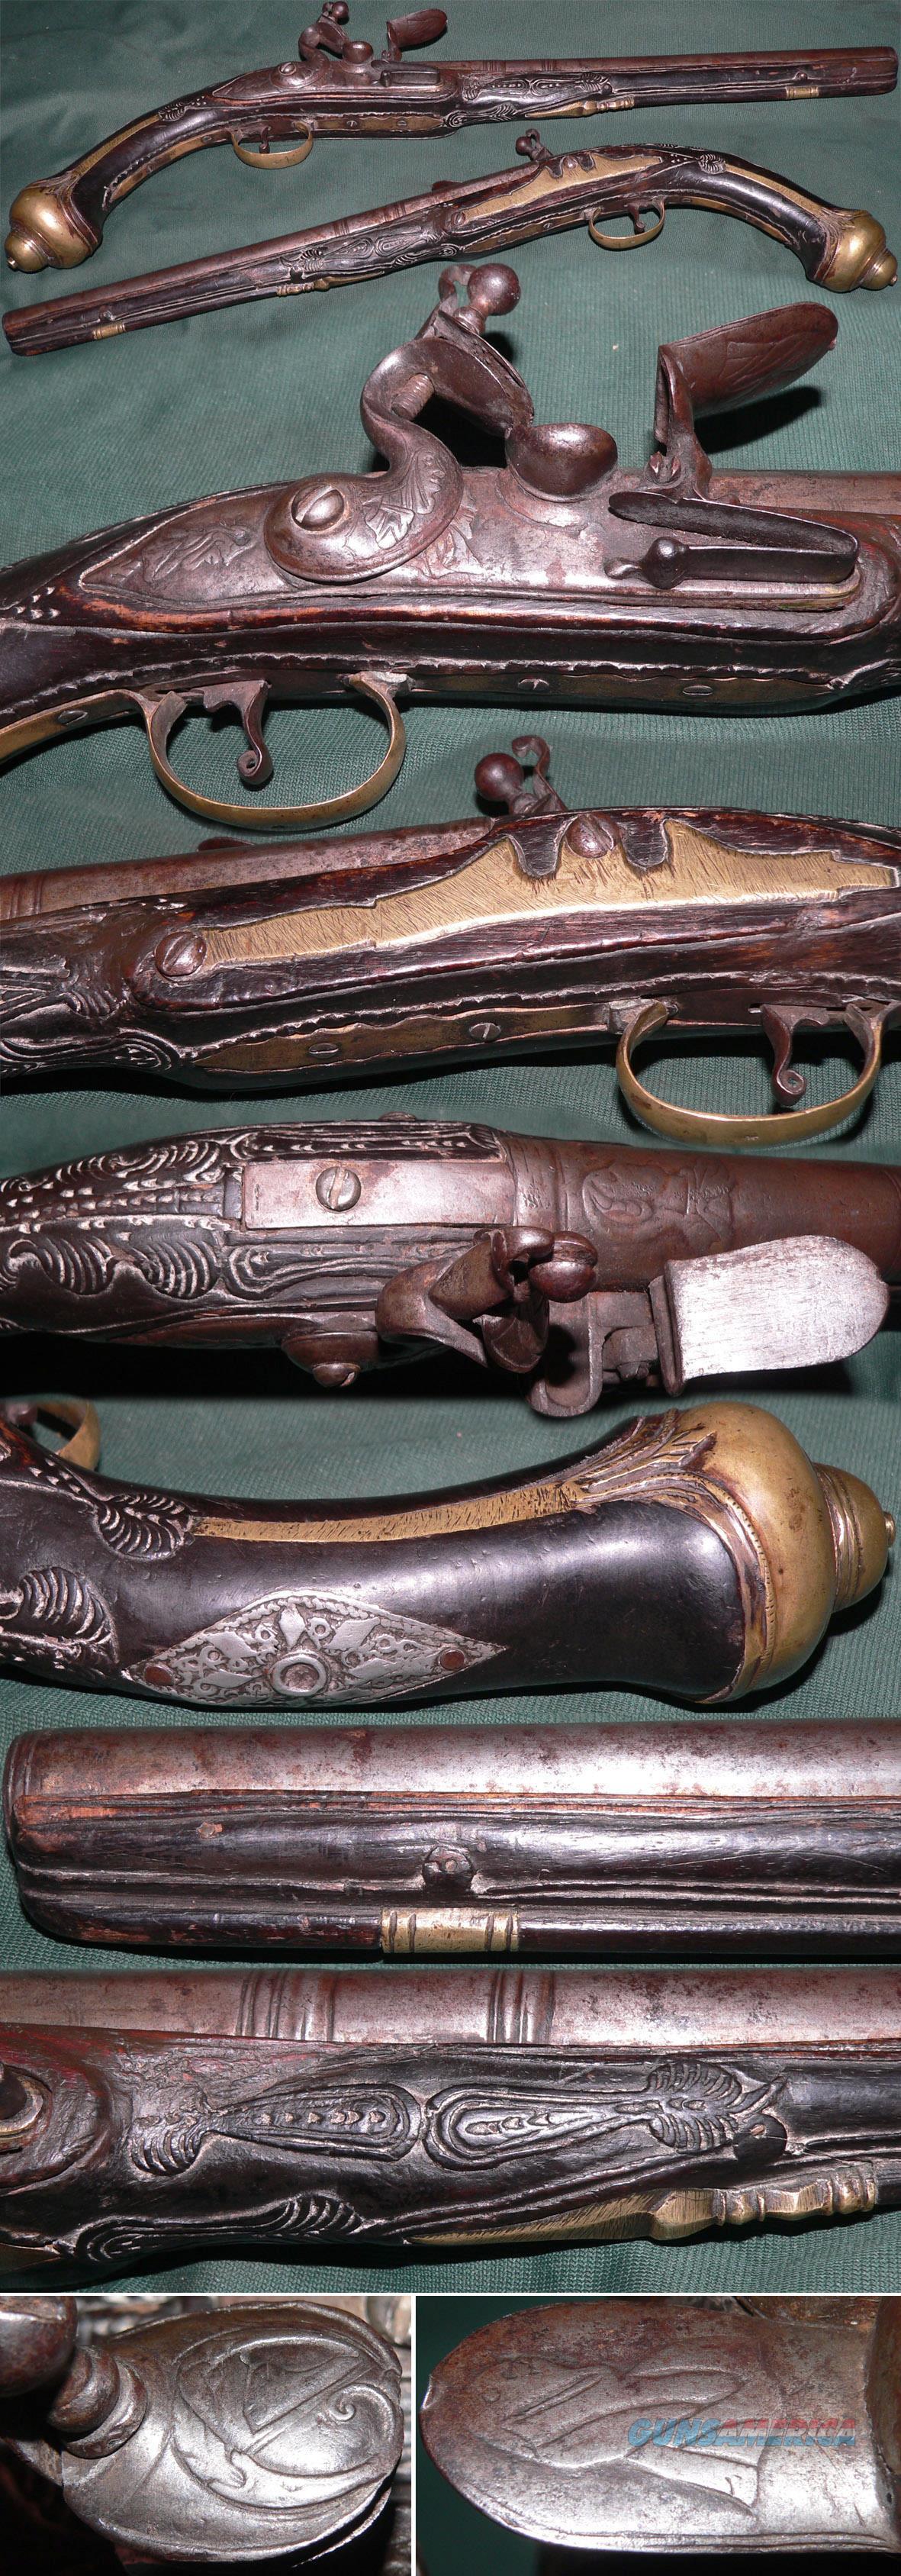 flintlock Mediterranean pistol with 6 human faces  Guns > Pistols > Muzzleloading Pre-1899 Pistols (flint)